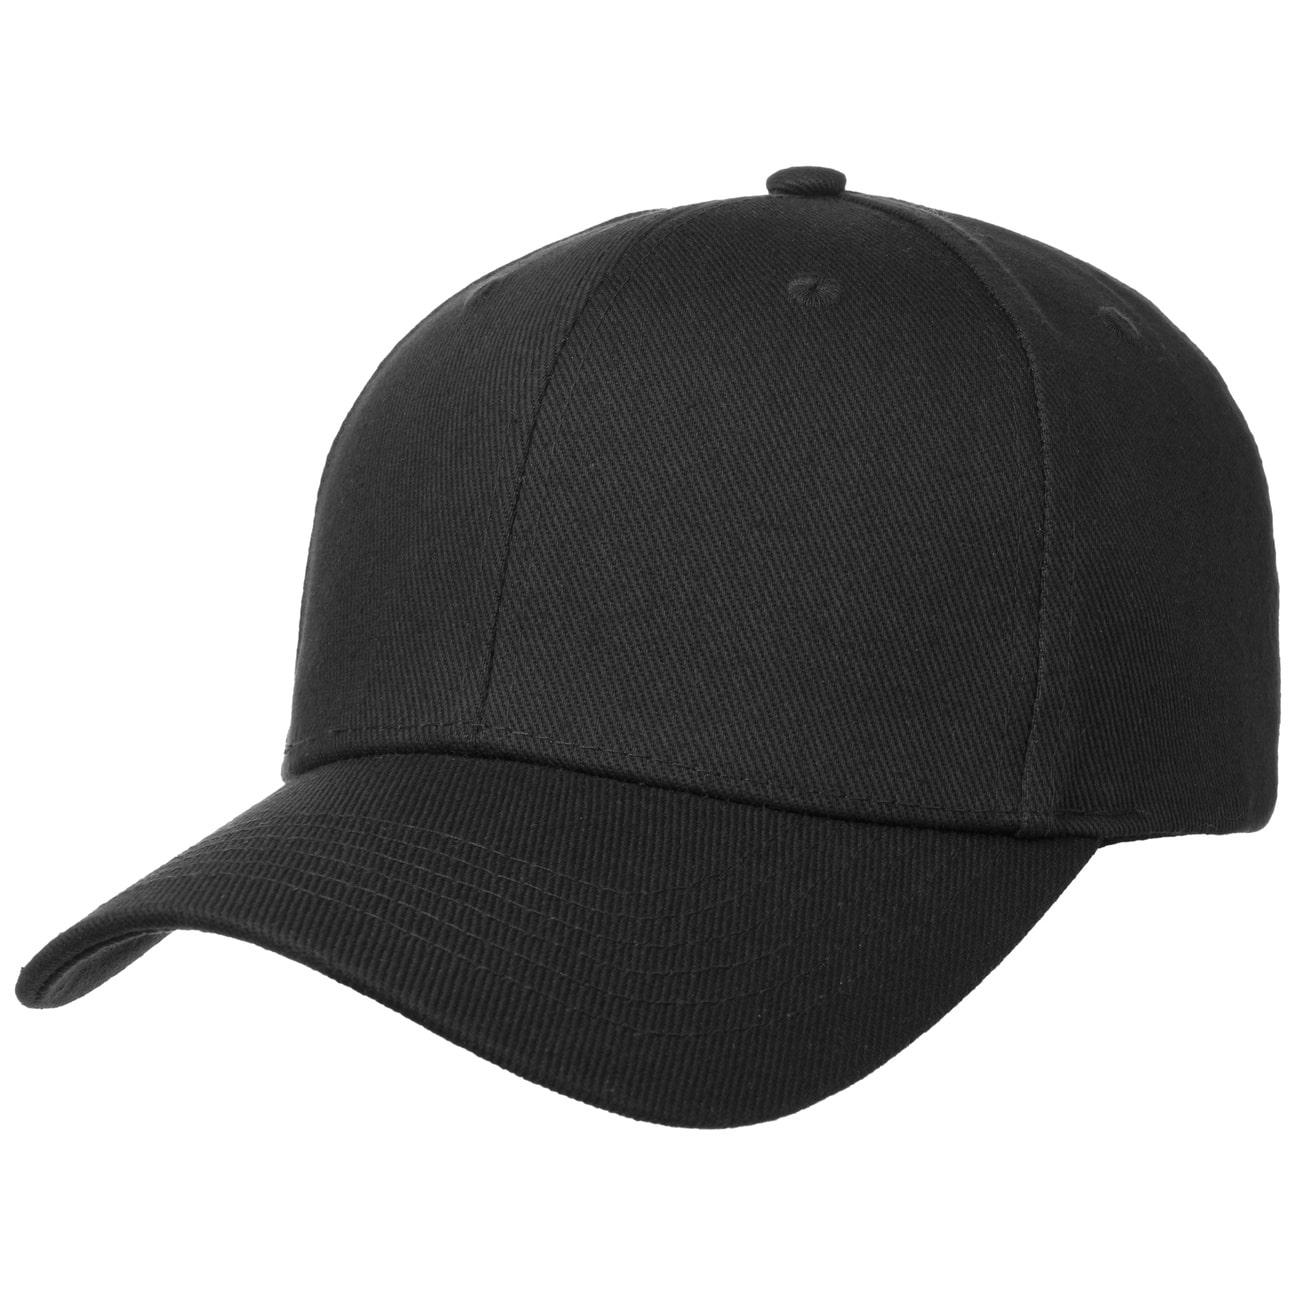 180bbbf3851 ... Champion Baseball Cap - black 1